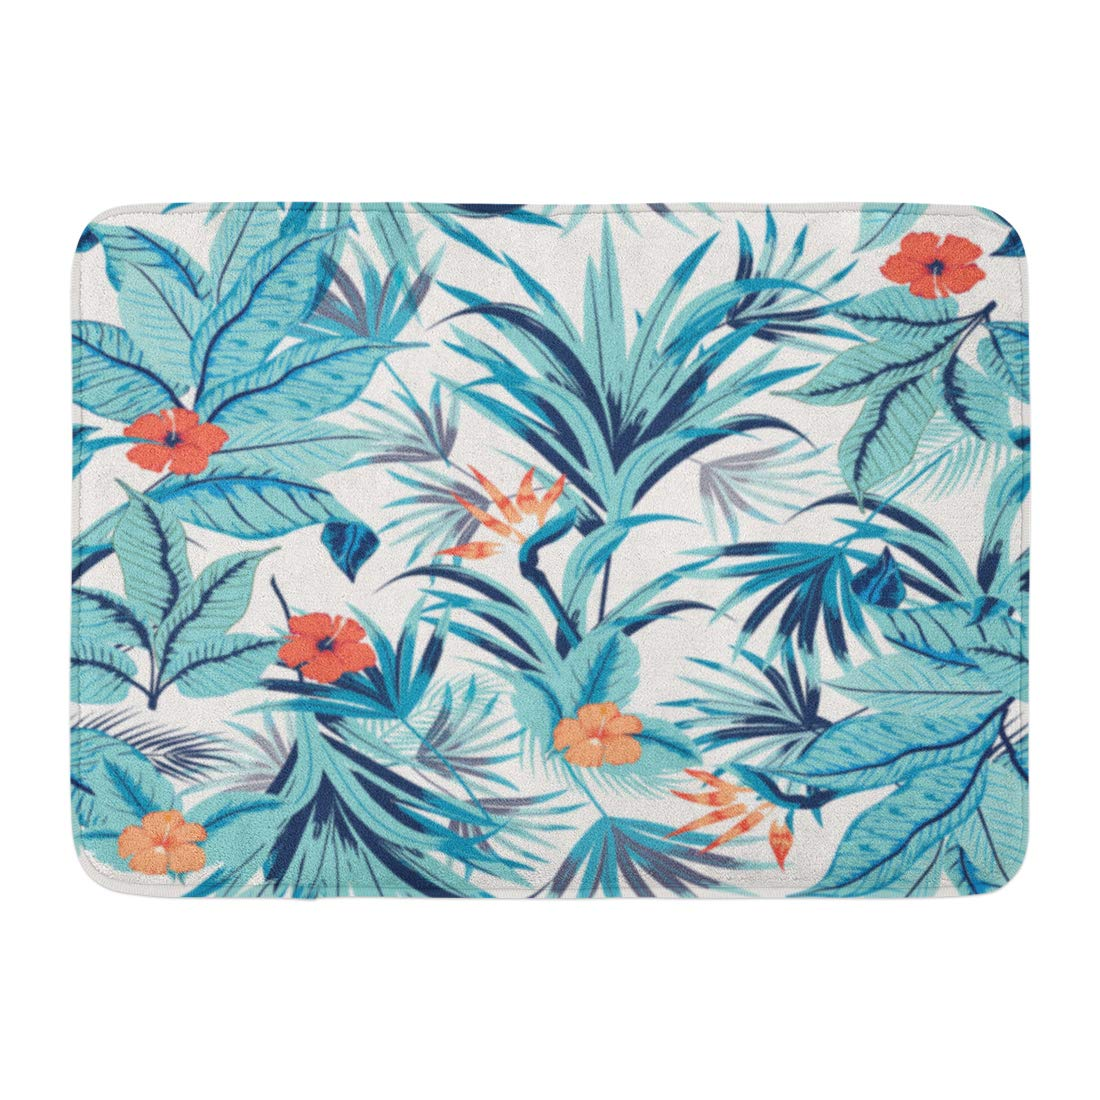 Emvency Doormats Bath Rugs Outdoor//Indoor Door Mat Bird Floral Pattern Hummingbirds Tropical Japanese Flowers Butterflies Butterfly Bathroom Decor Rug Bath Mat 16 x 24